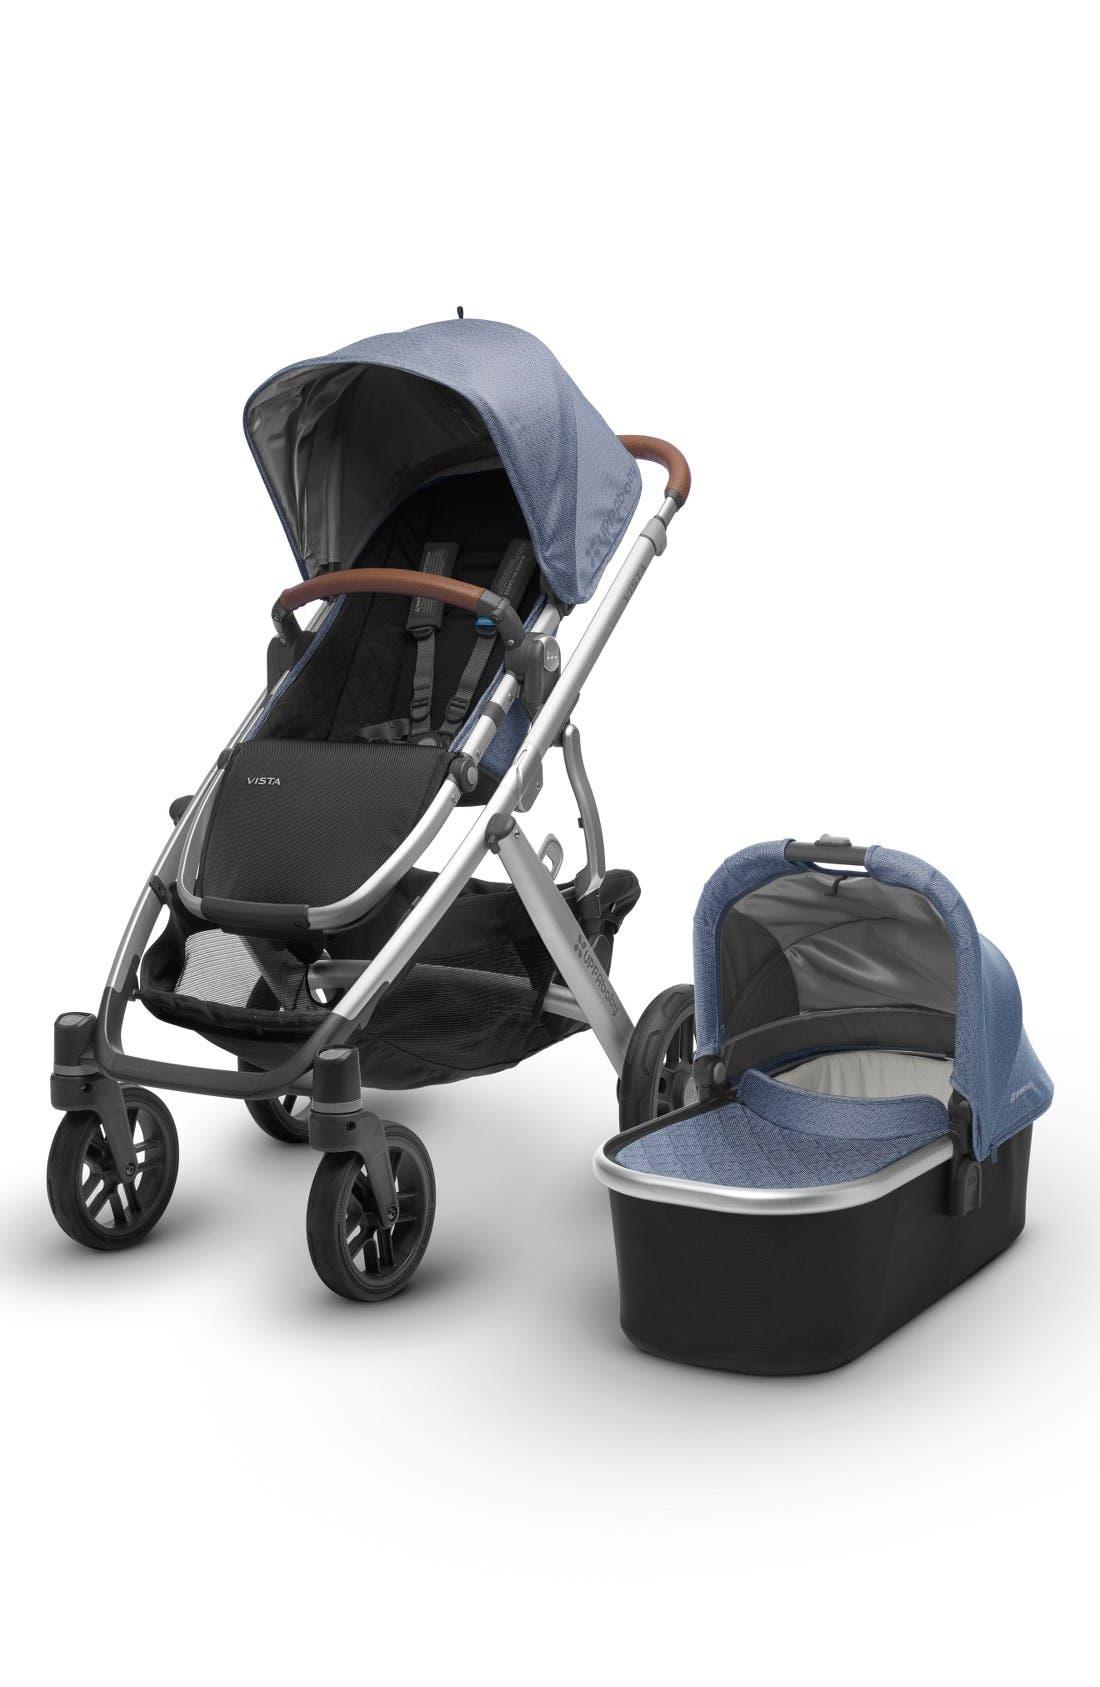 2017 VISTA Henry Aluminum Frame Convertible Stroller with Bassinet & Toddler Seat,                         Main,                         color, Blue Marl